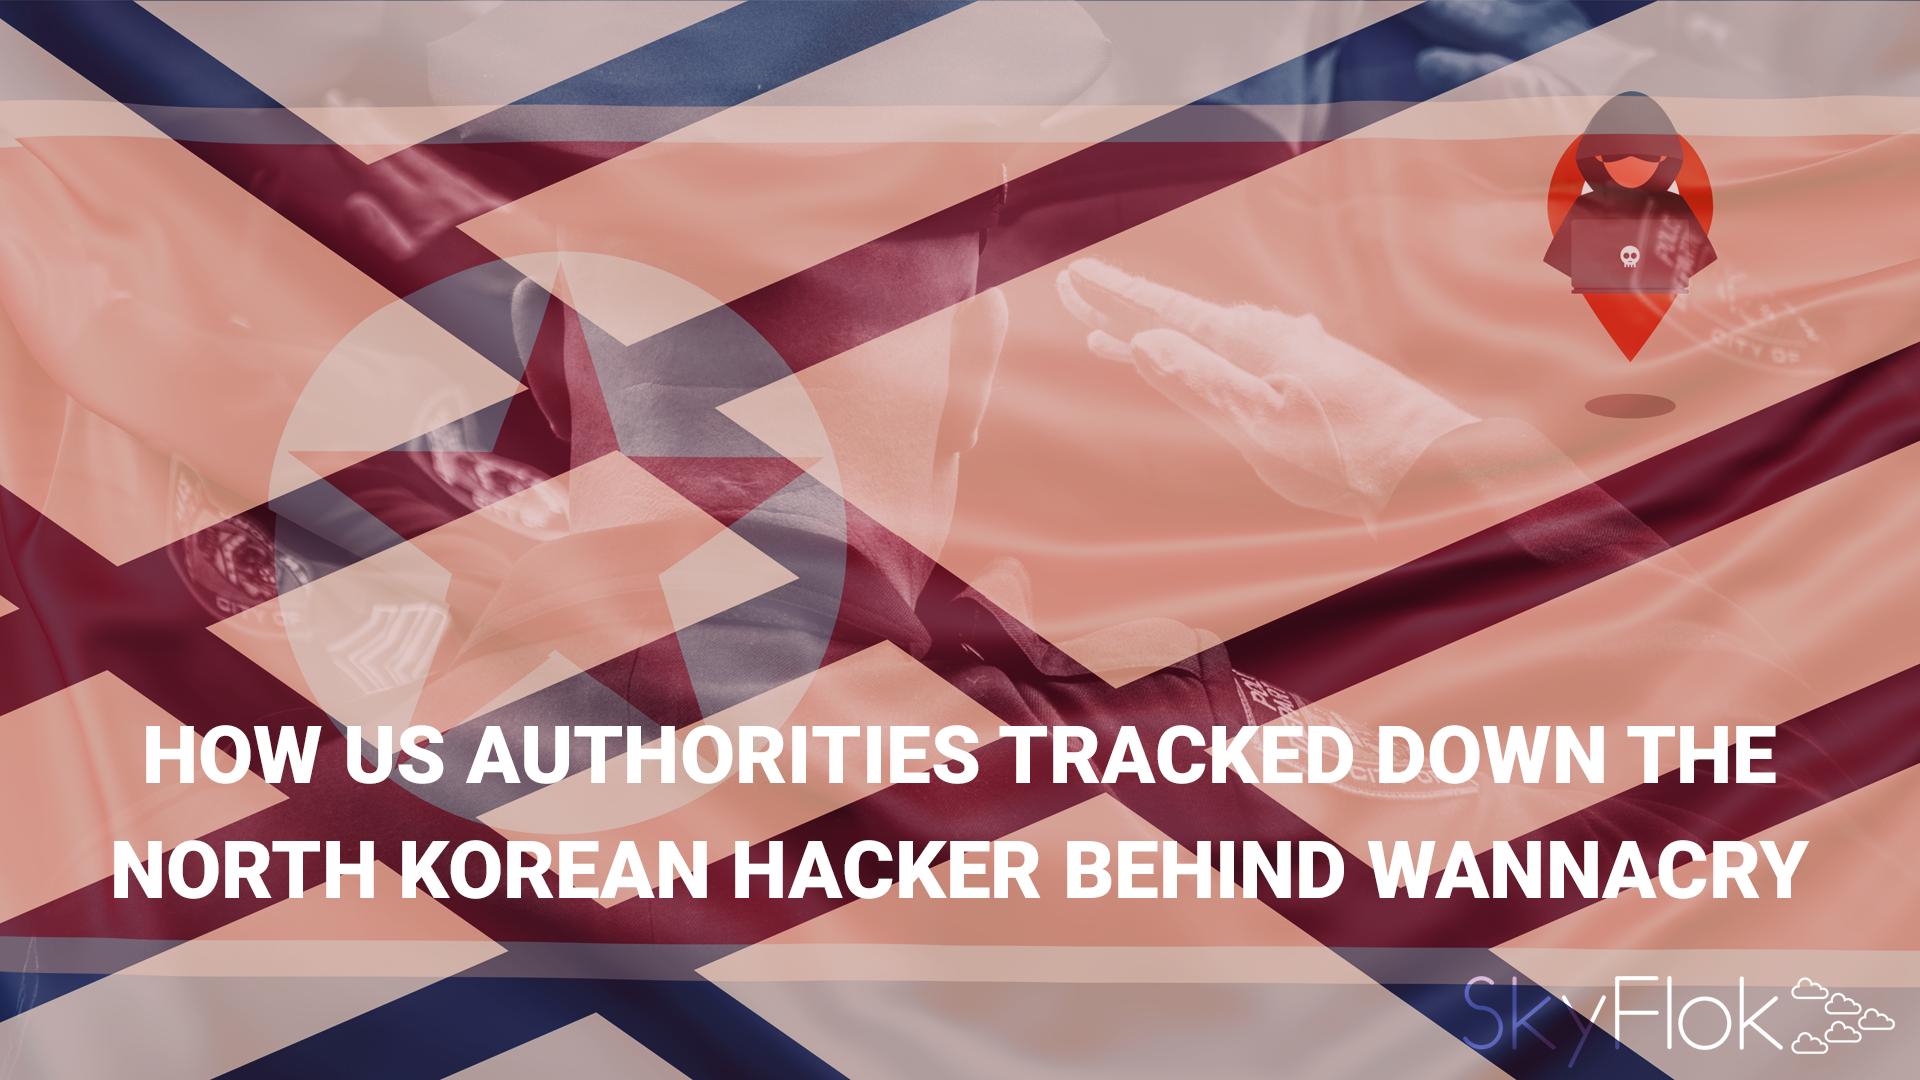 How US authorities tracked down the North Korean hacker behind WannaCry